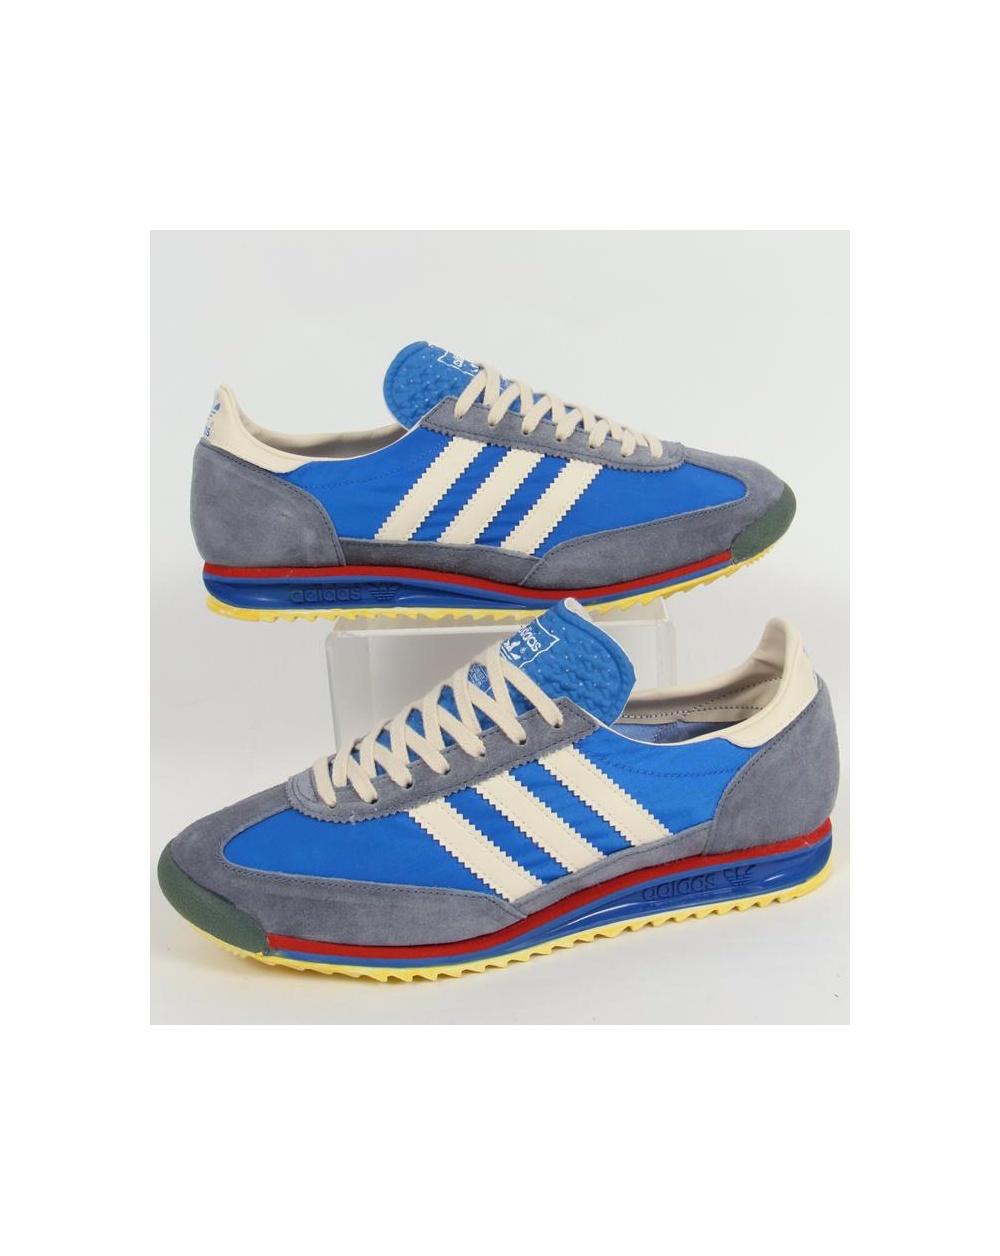 classic adidas trainers uk